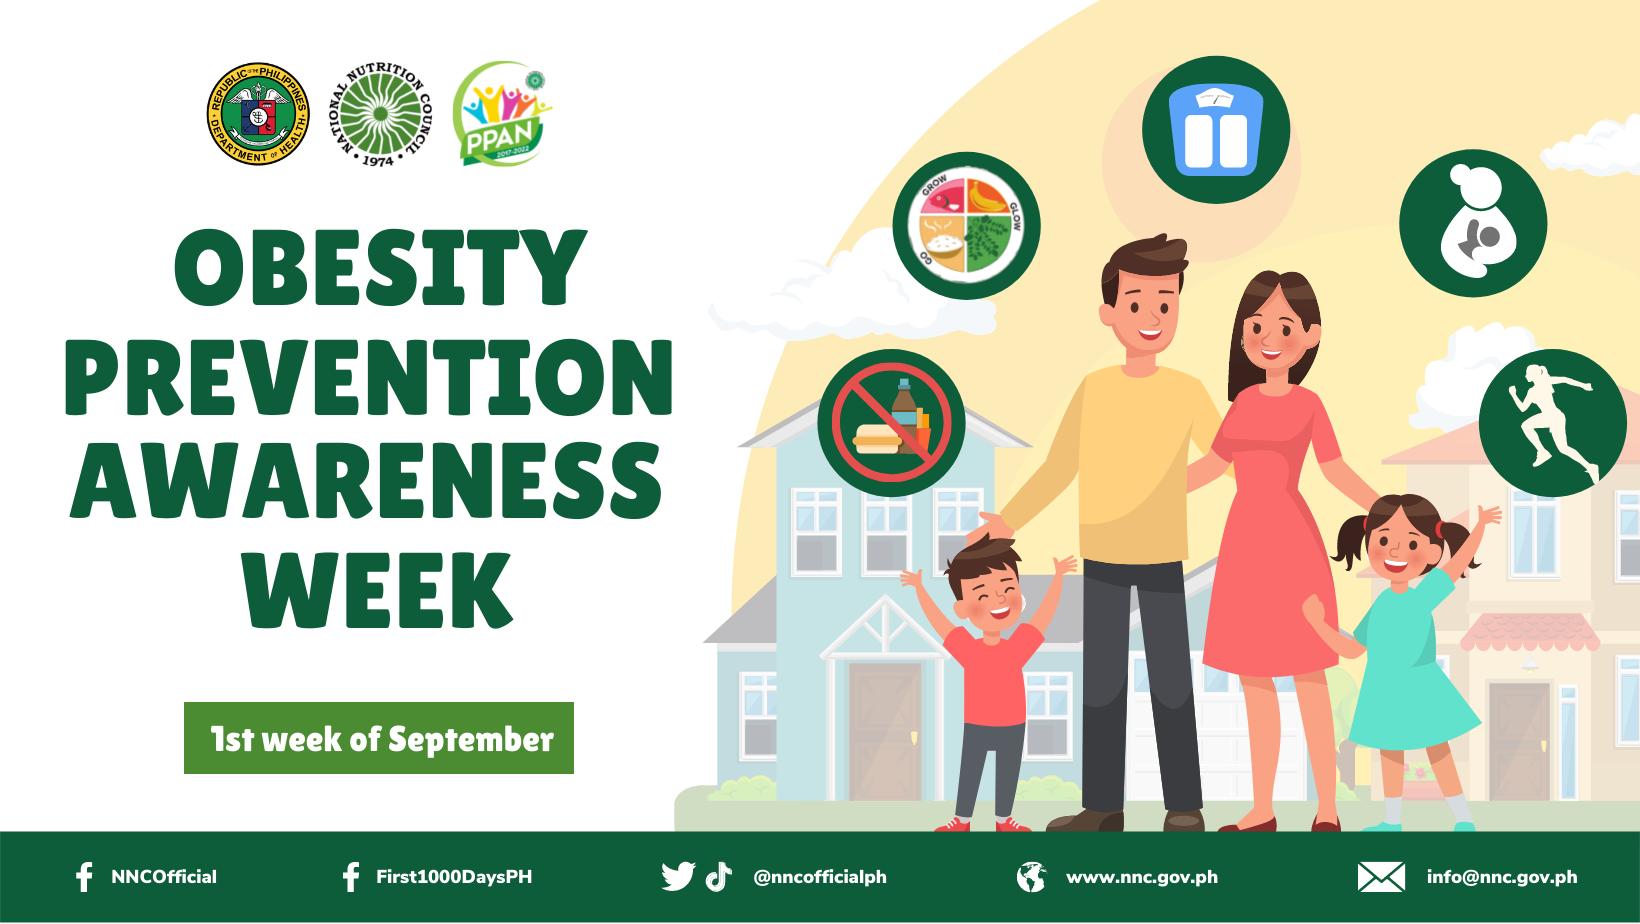 Obesity Prevention Awareness Week